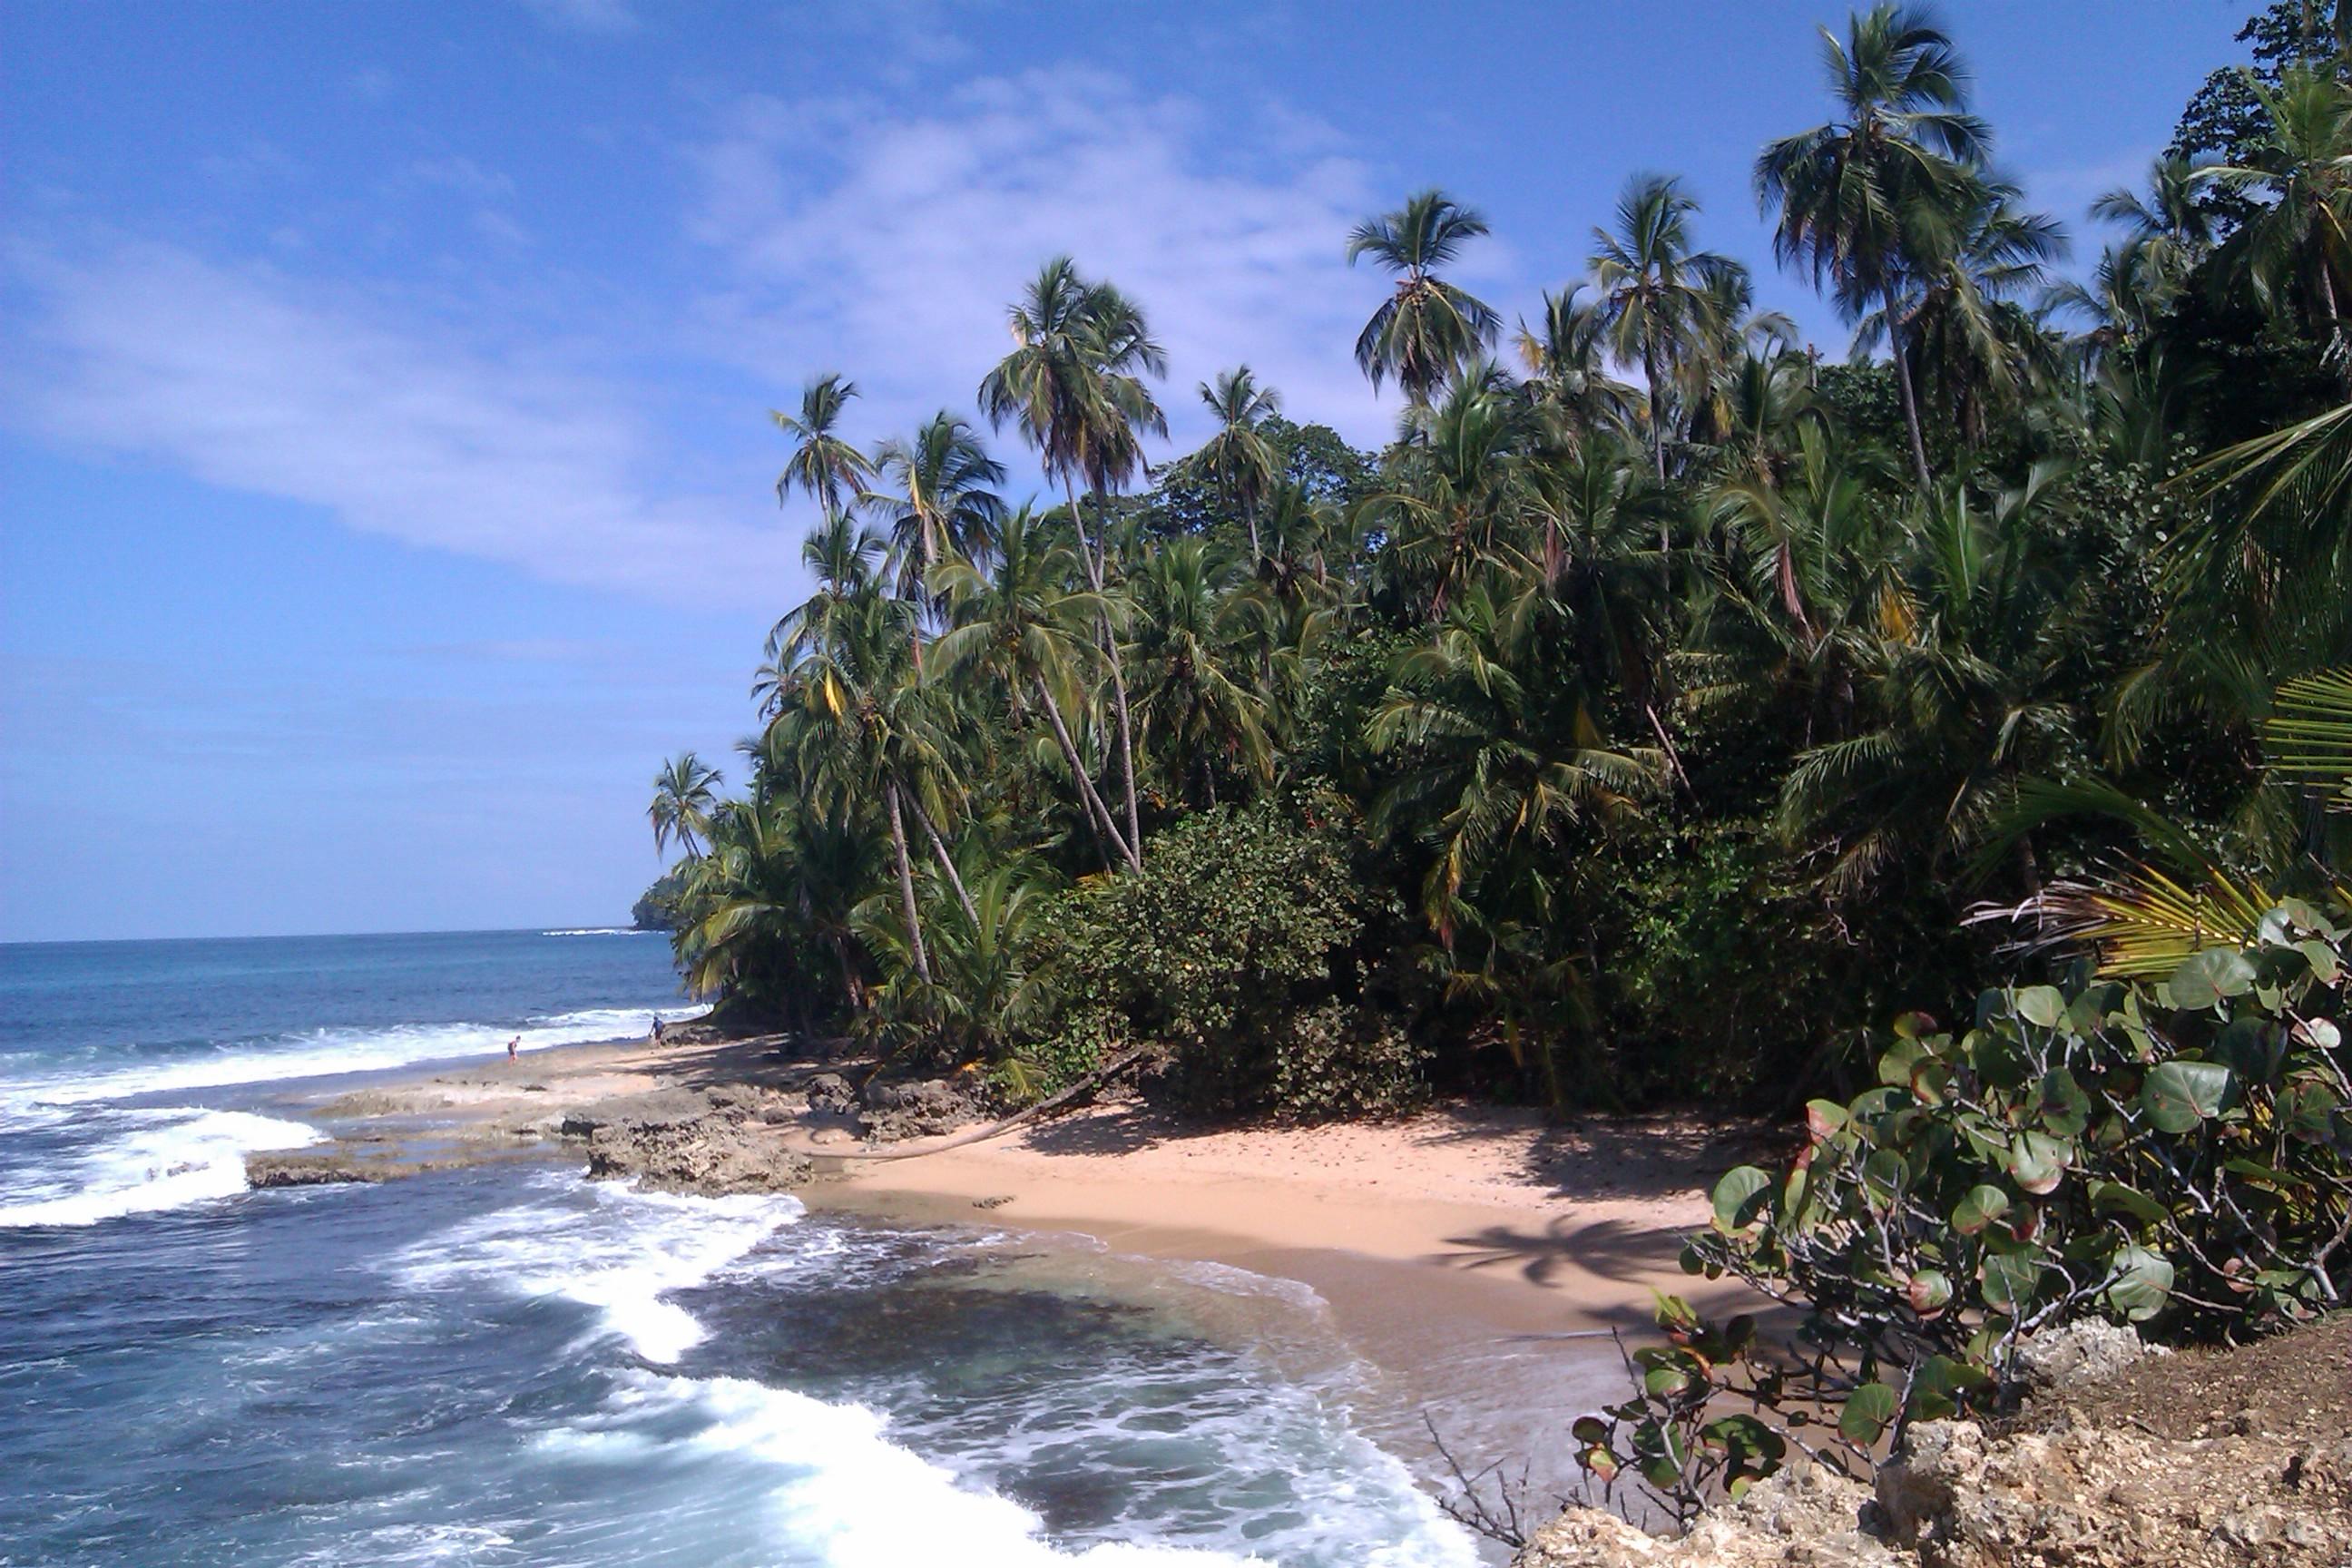 Costa Rica trip planner - SJ-PV-TOR-AR-MV-SA